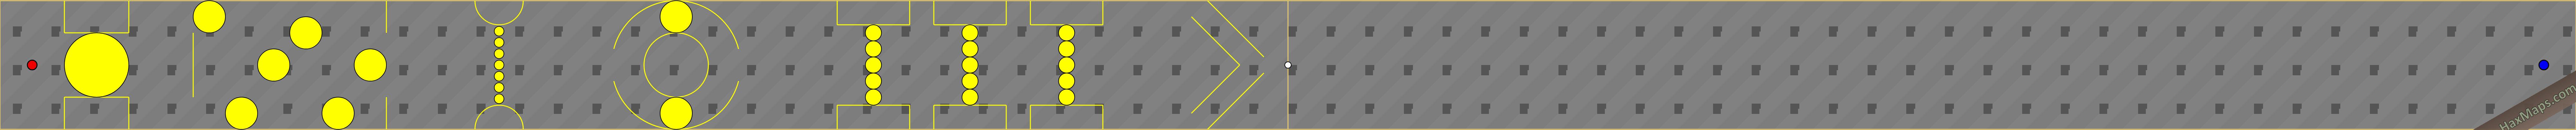 hax ball maps | Yellow-12